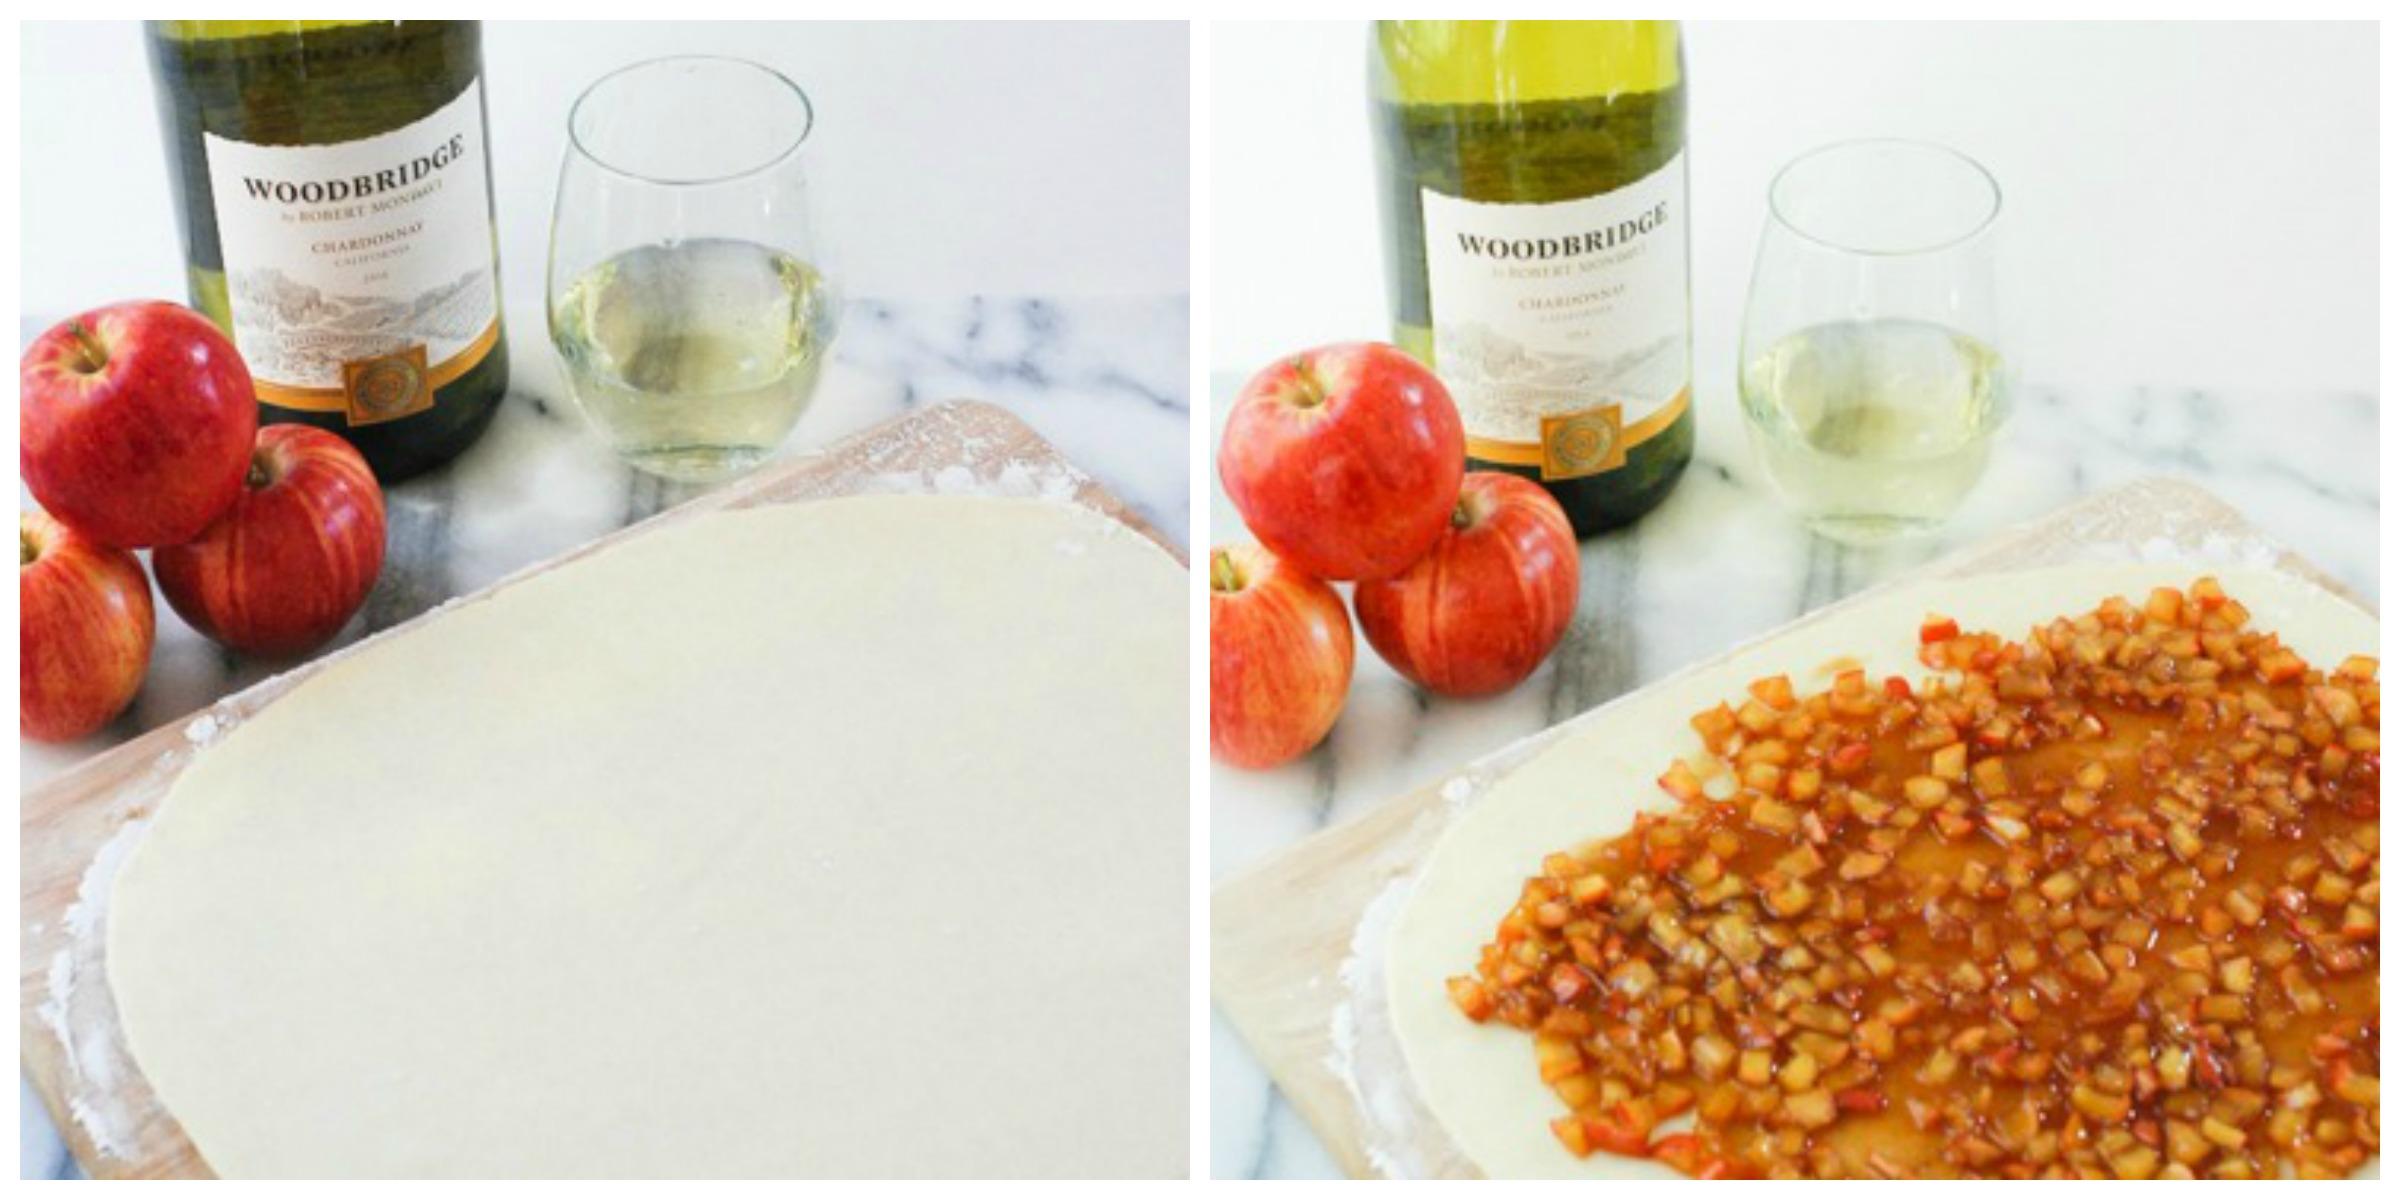 Chardonnay, cabernet sauvignon